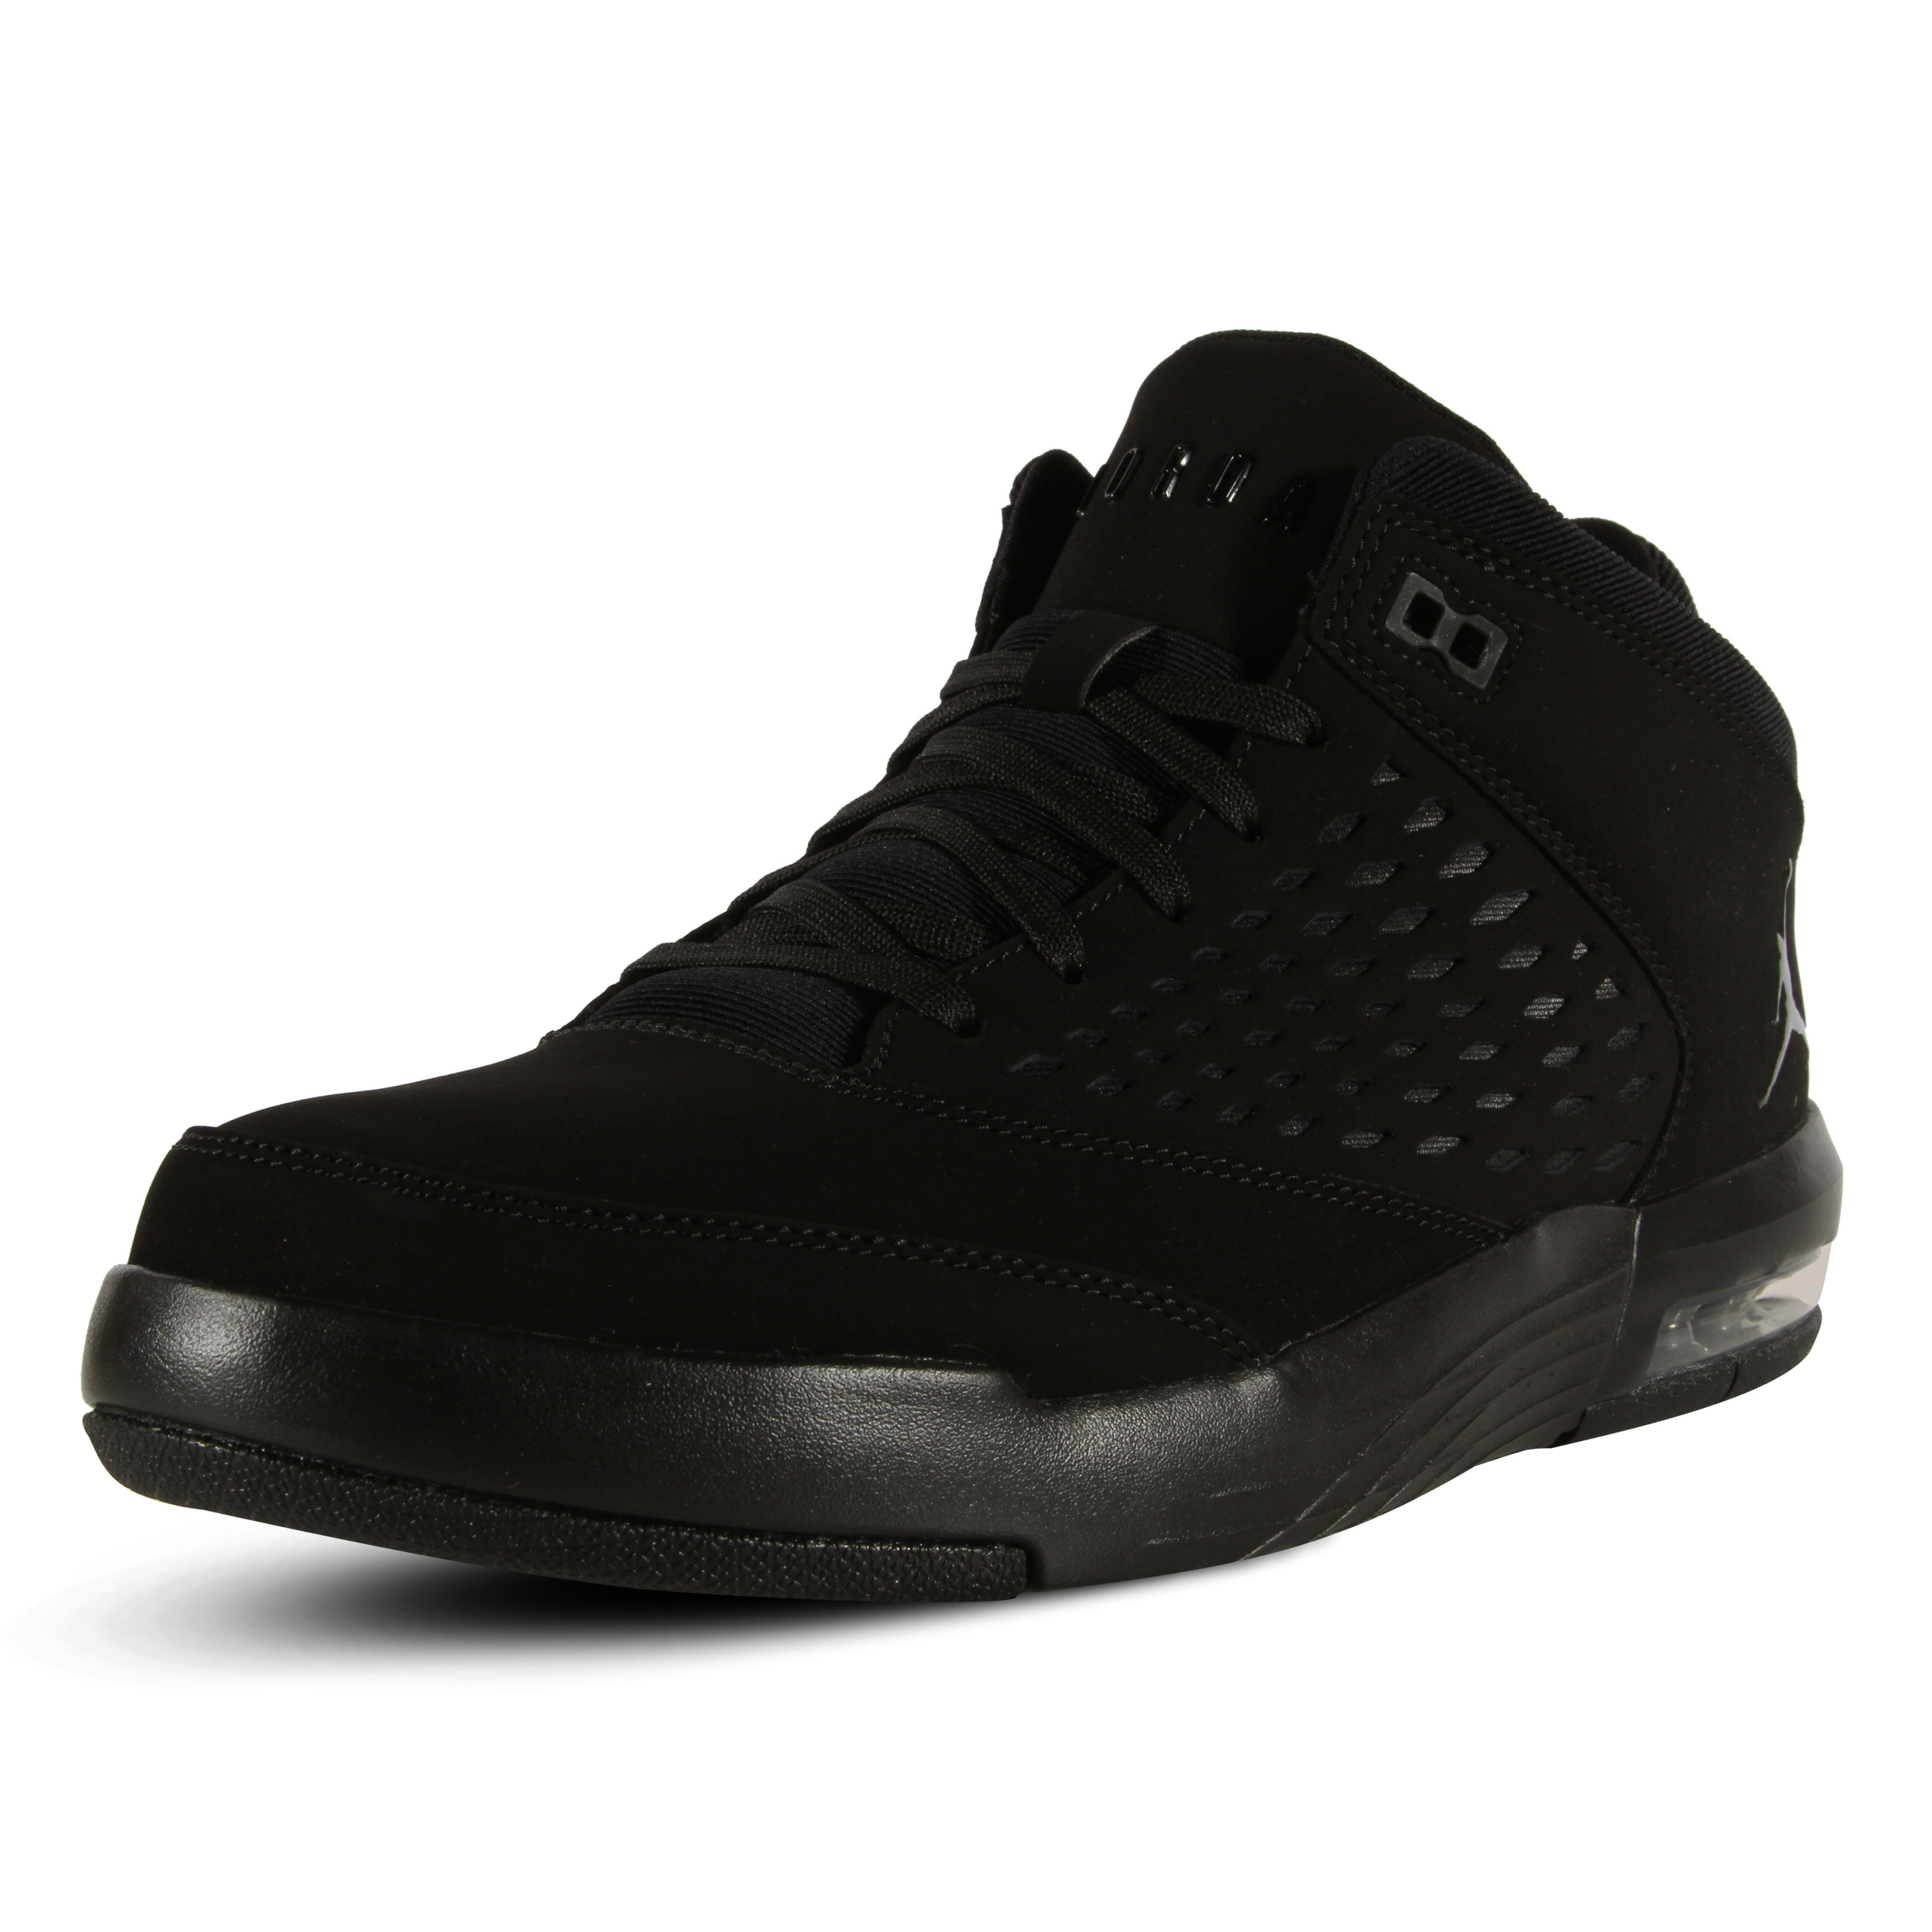 ... cheap prices c737b 974b2 Mens Jordan Flight Origin 4 Sport Casual Shoes  921196-010. ... 86adf2a0e